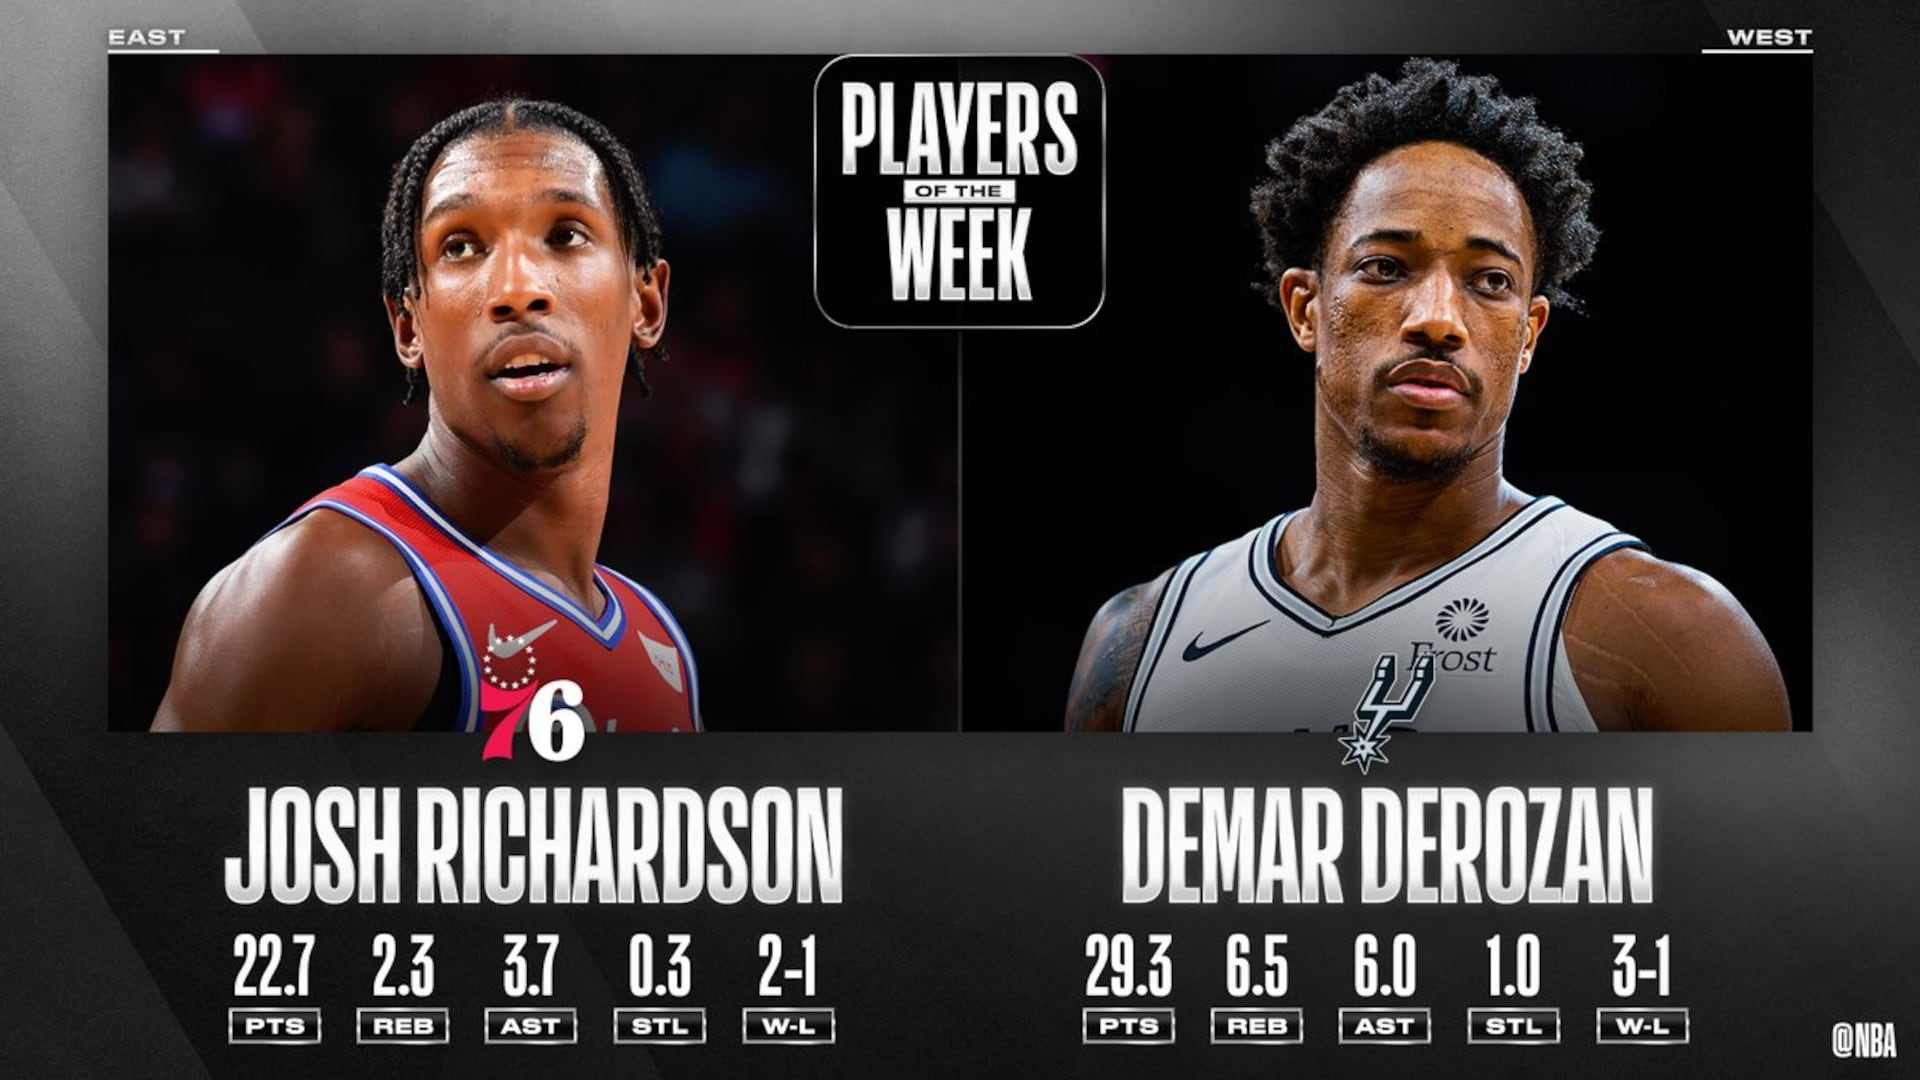 Josh Richardson, DeMar DeRozan named NBA Players of the Week